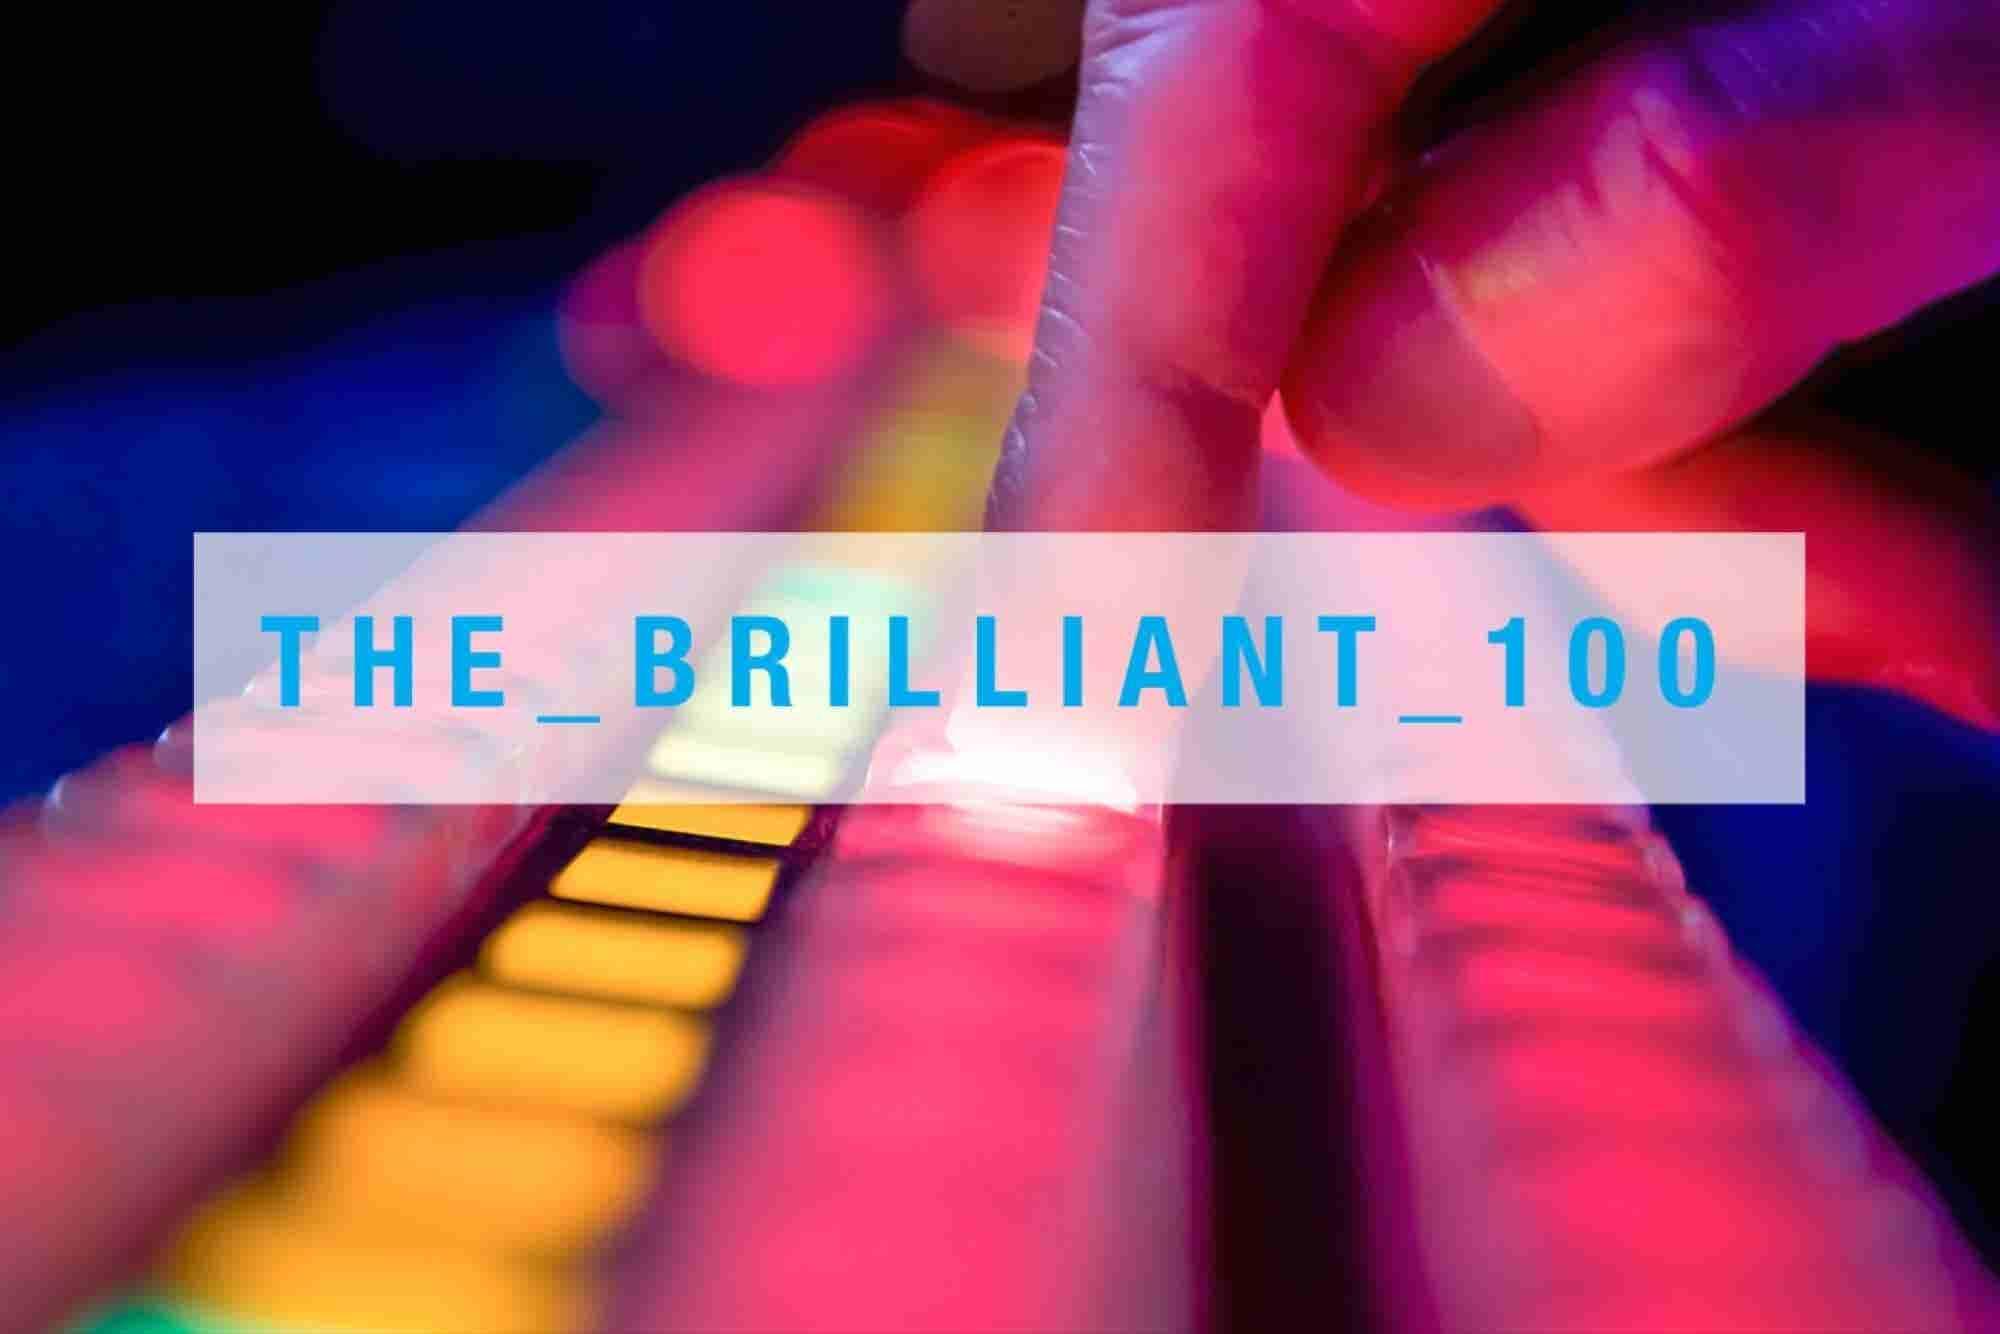 10 Tech Companies to Watch - Entrepreneur's Brilliant 100